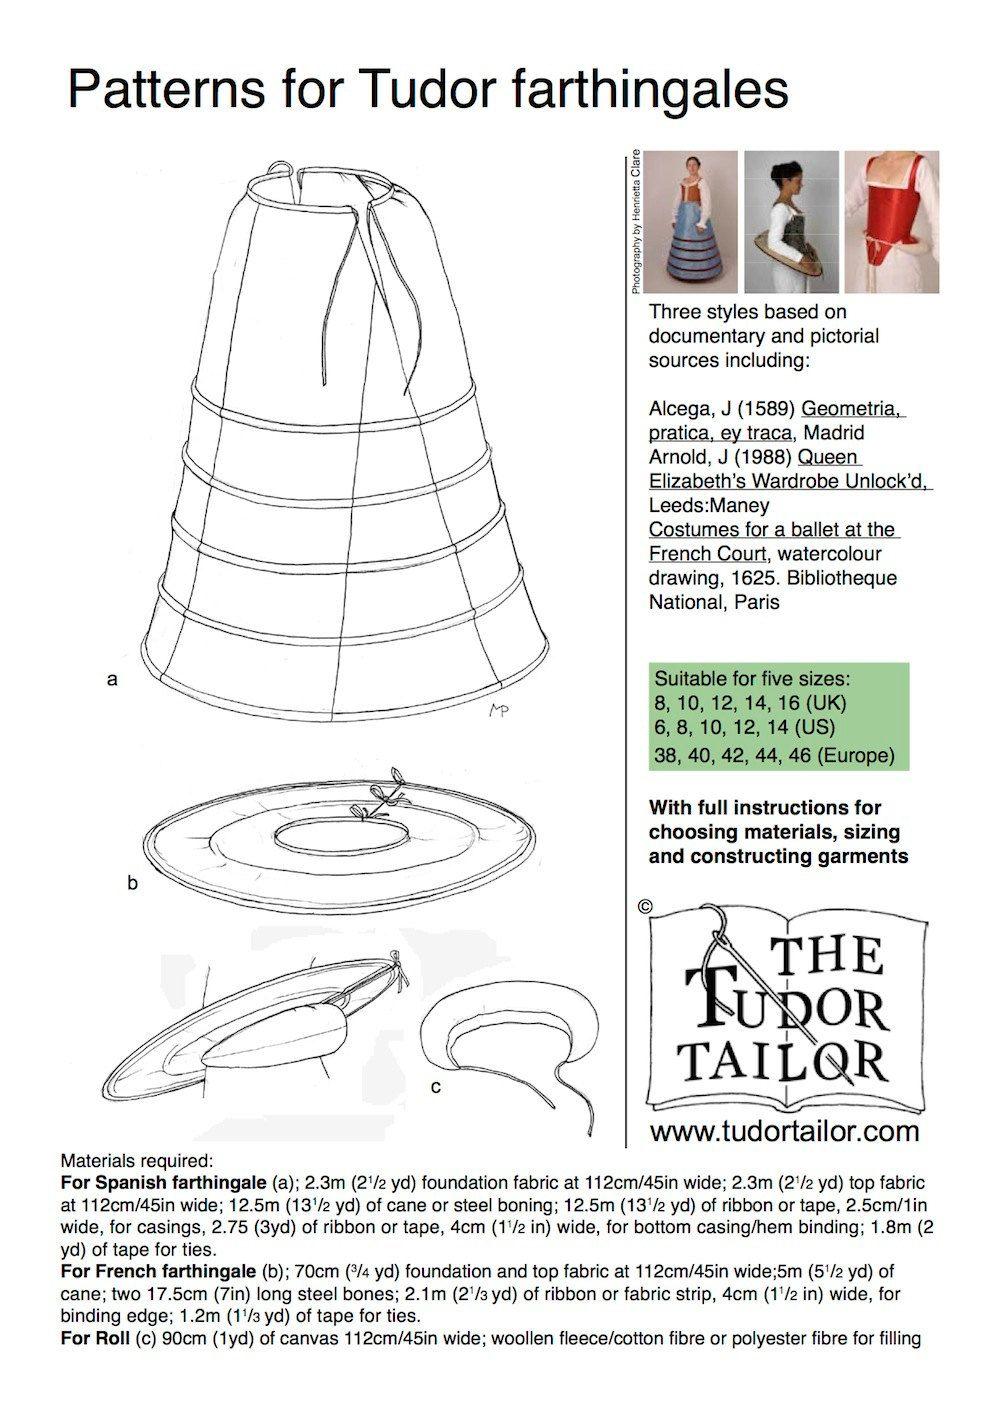 Shop | The Tudor Tailor | Pattern for Tudor and Elizabethan ...